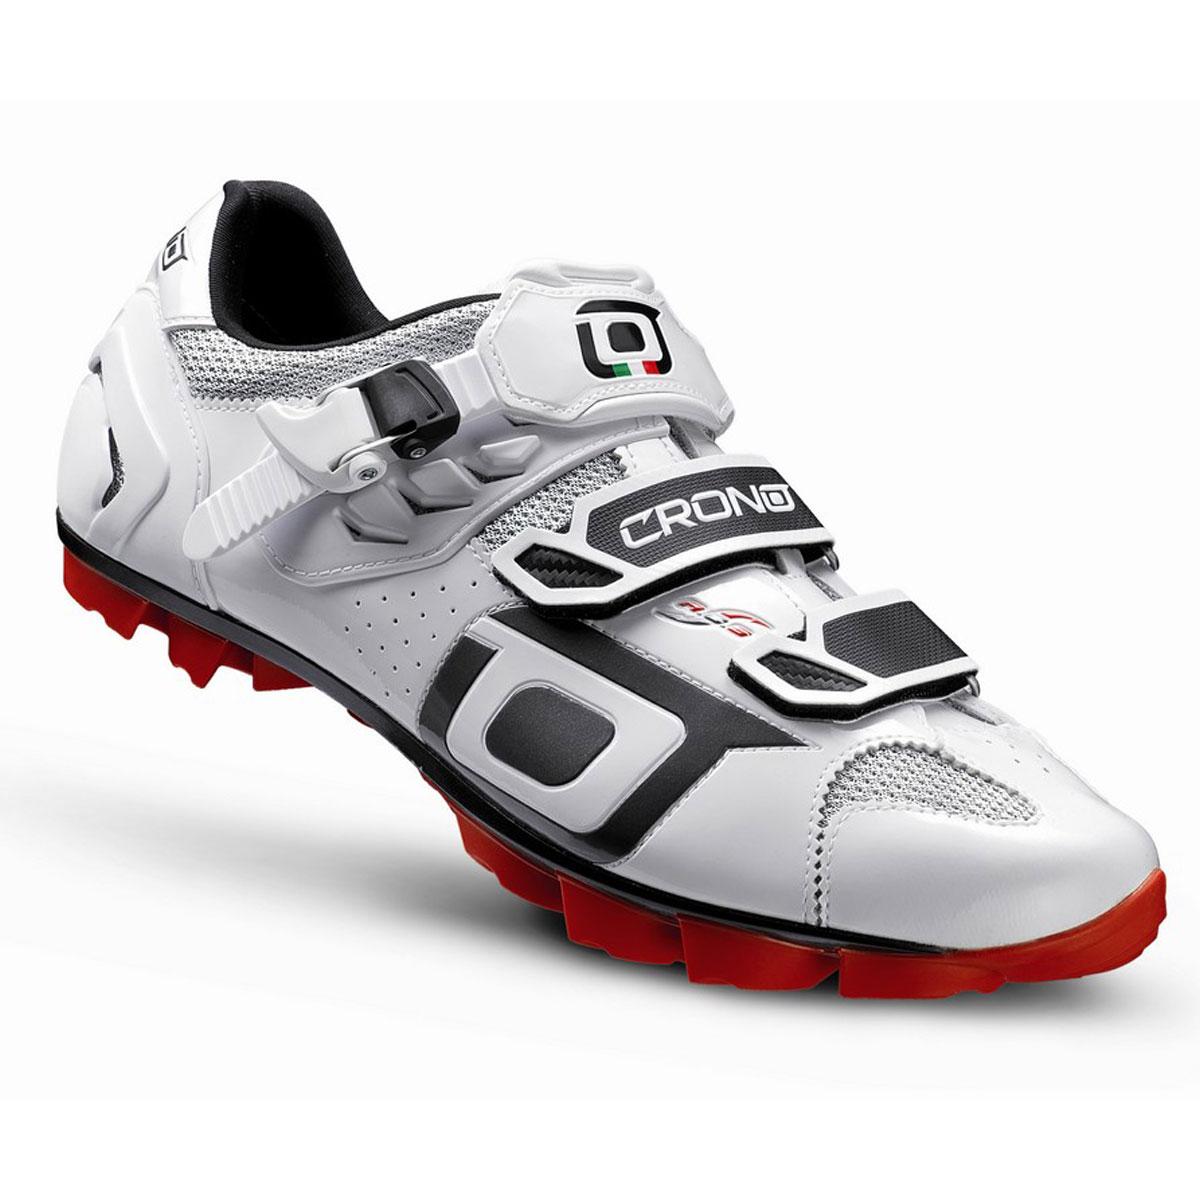 Boty Crono MTB Track white, 40